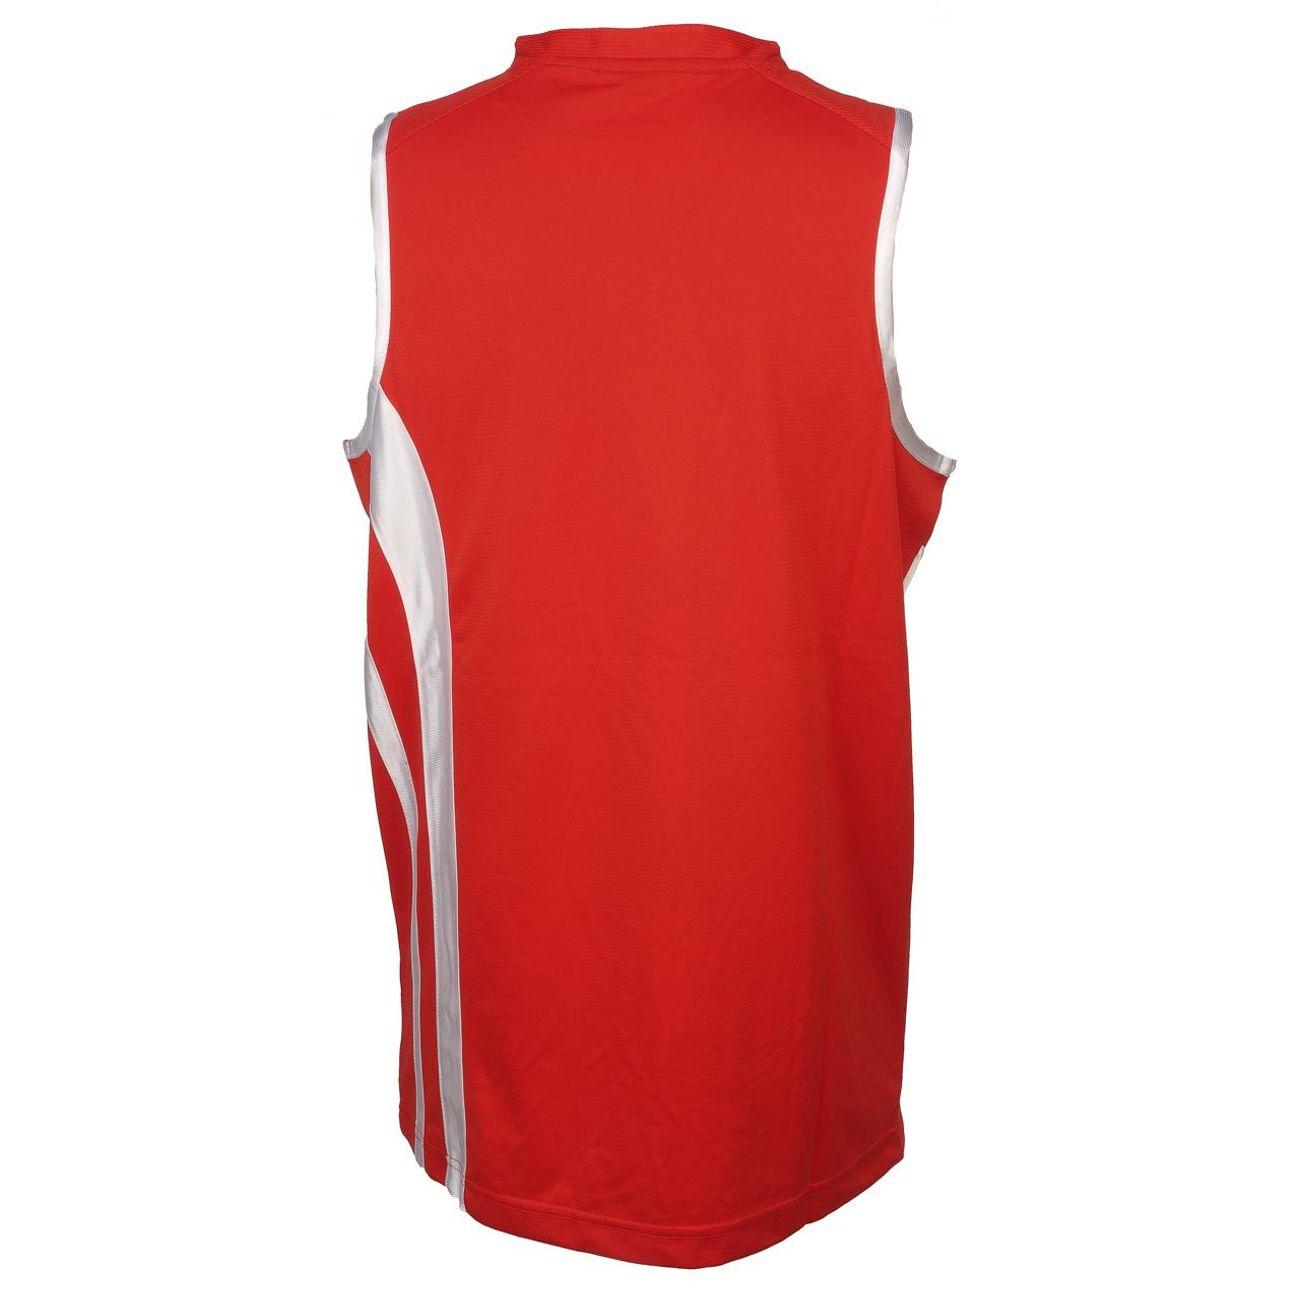 Basket ball homme SPALDING Mvp maillot rouge